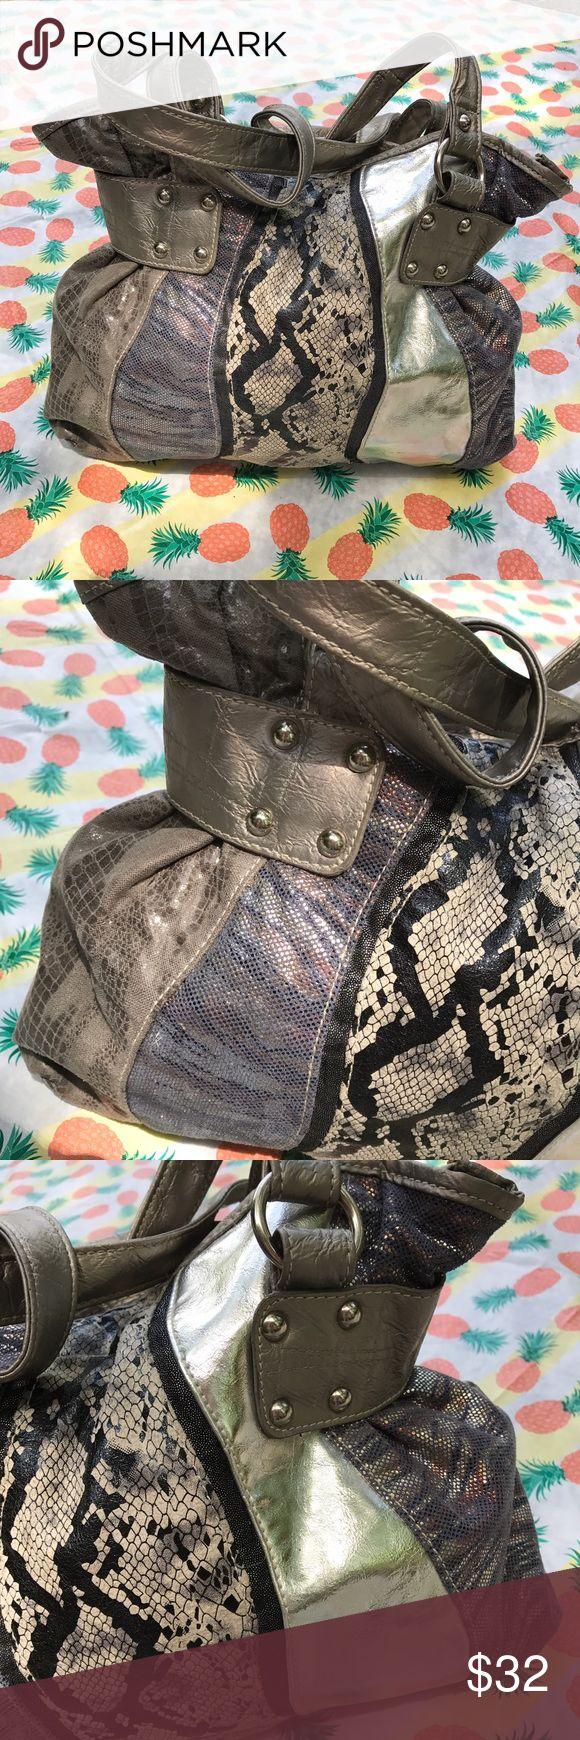 Silver Animal Print Faux Leather Shoulder Bag NWOT | Excellent Condition | Silver Crackled Faux Leather | Mixed Animal Prints | Shoulder Bag | Snap Closure | 2 Open Pockets Inside | 1 Zipper Pocket Inside | Length: 14.5ins | Height: 10ins | Shoulder Drop: 10ins | Chateau Bags Shoulder Bags